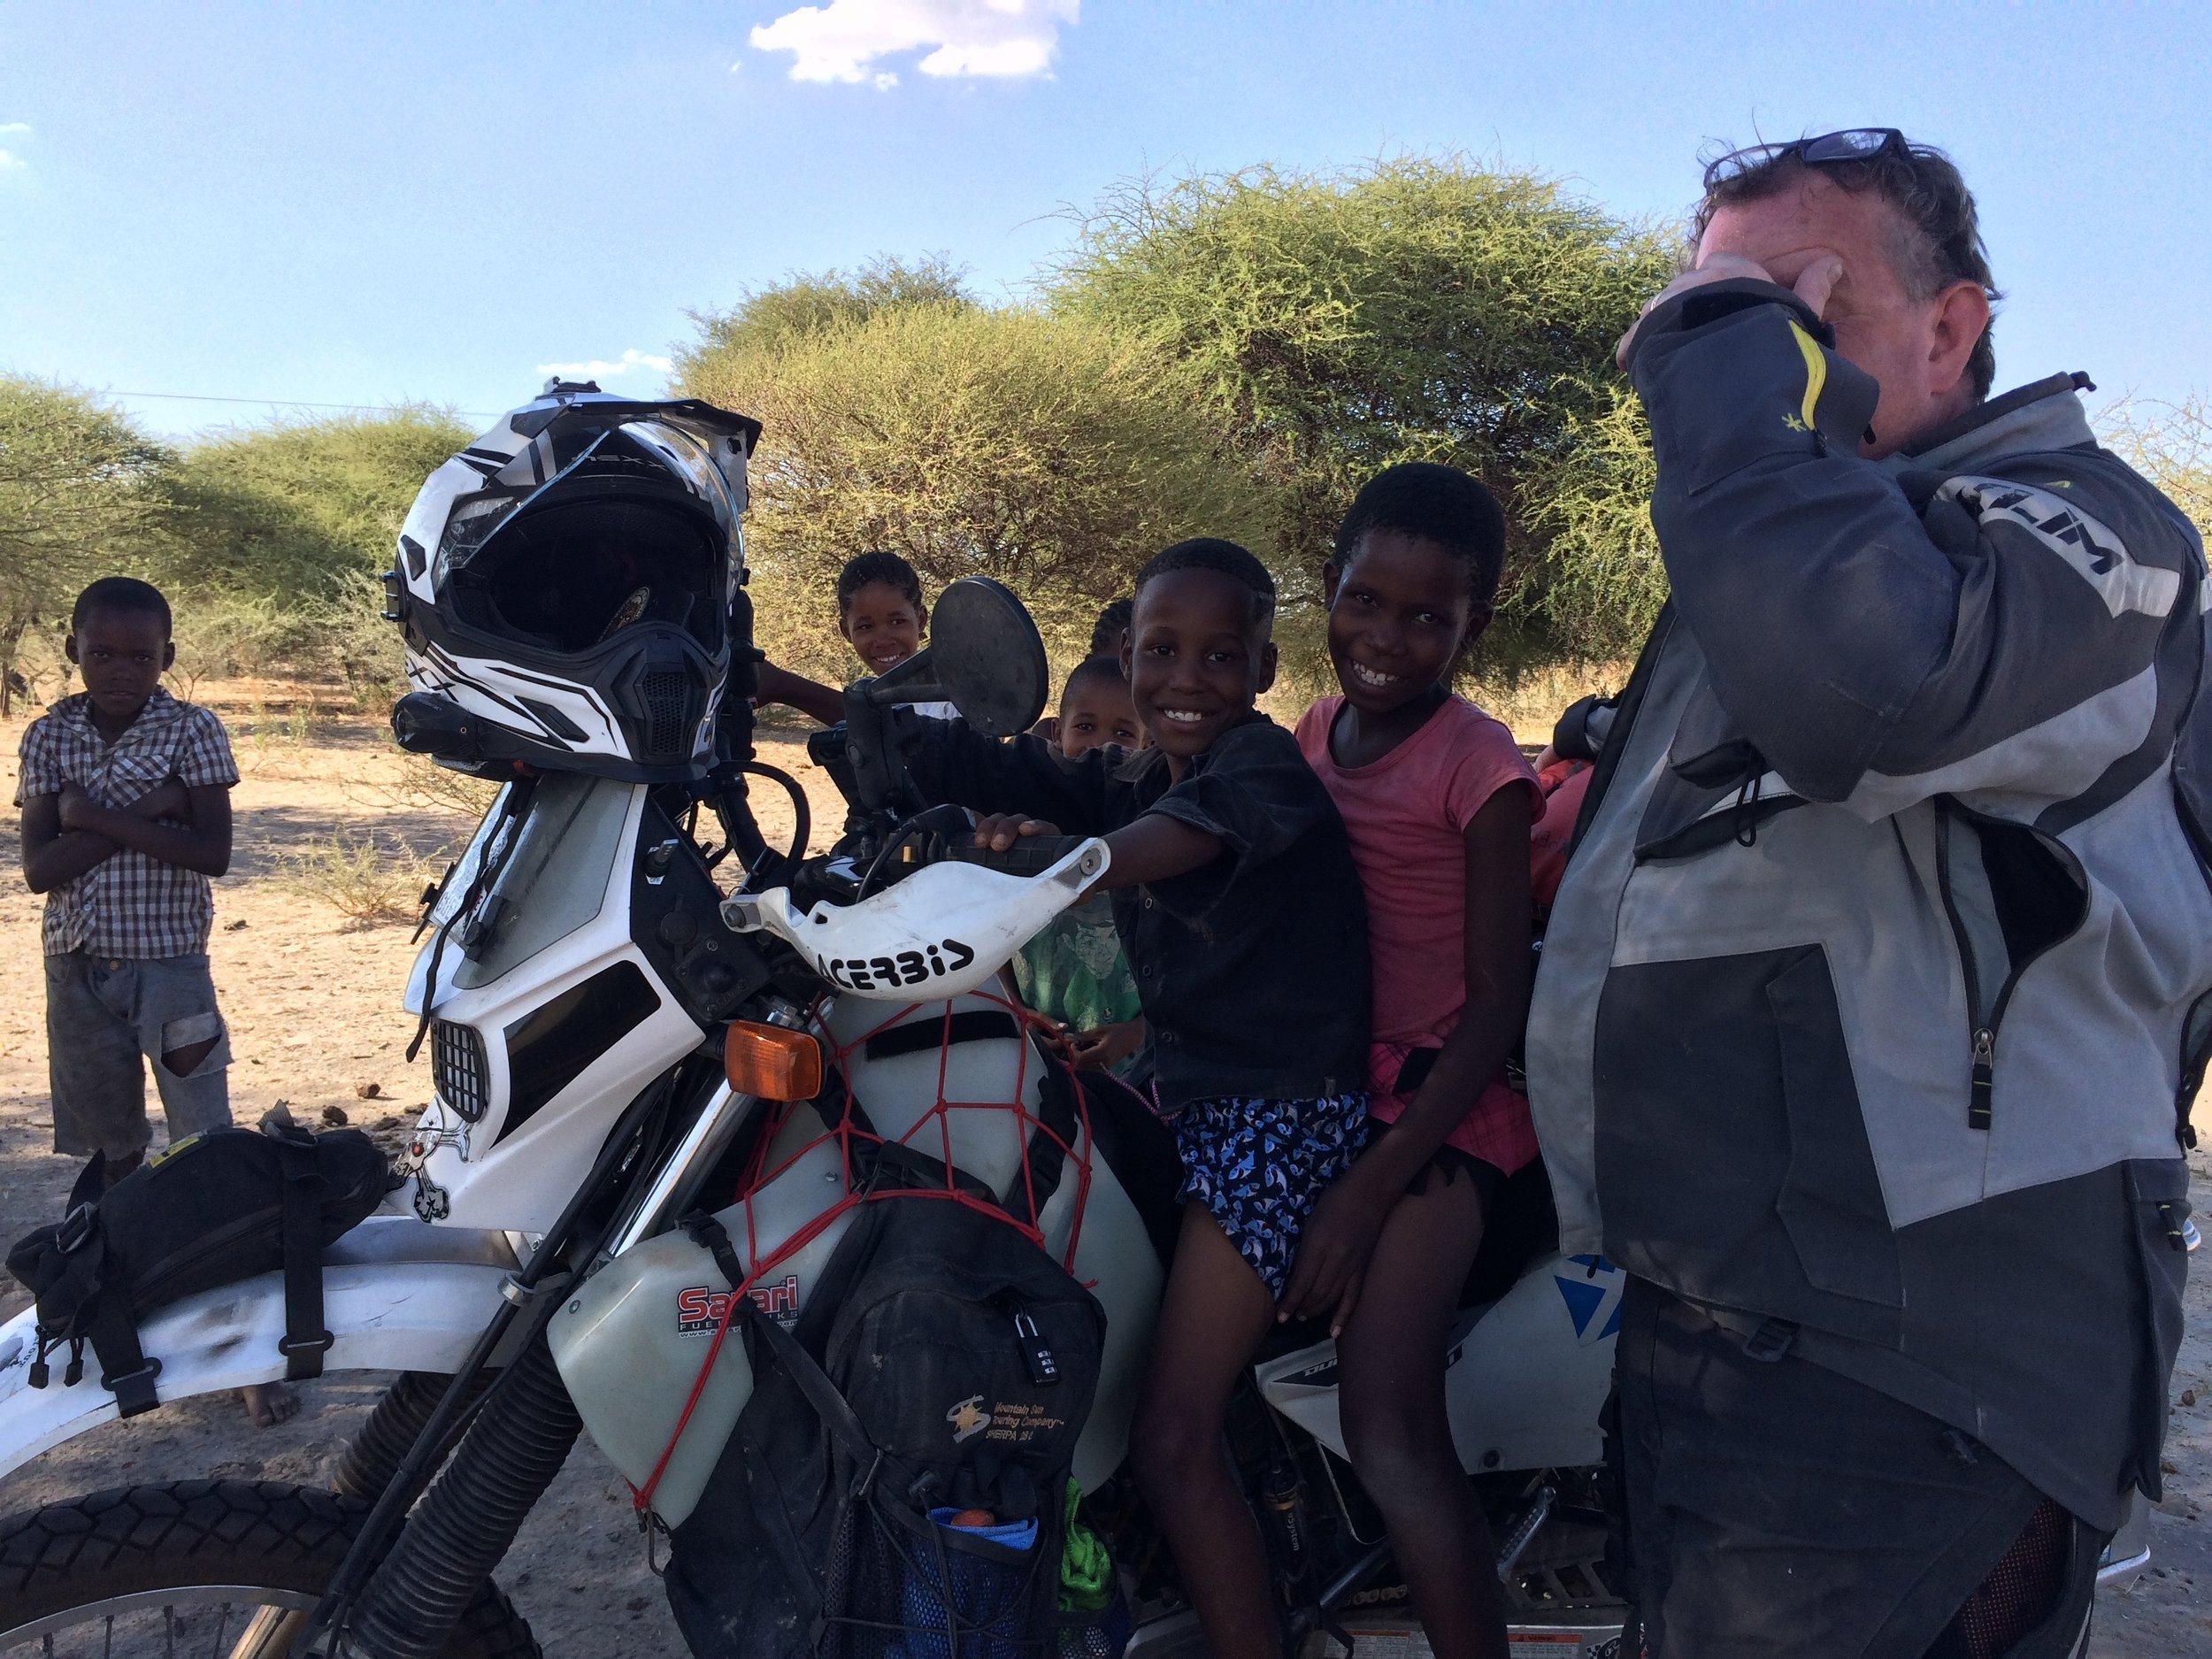 Oh no, kids on my bike!